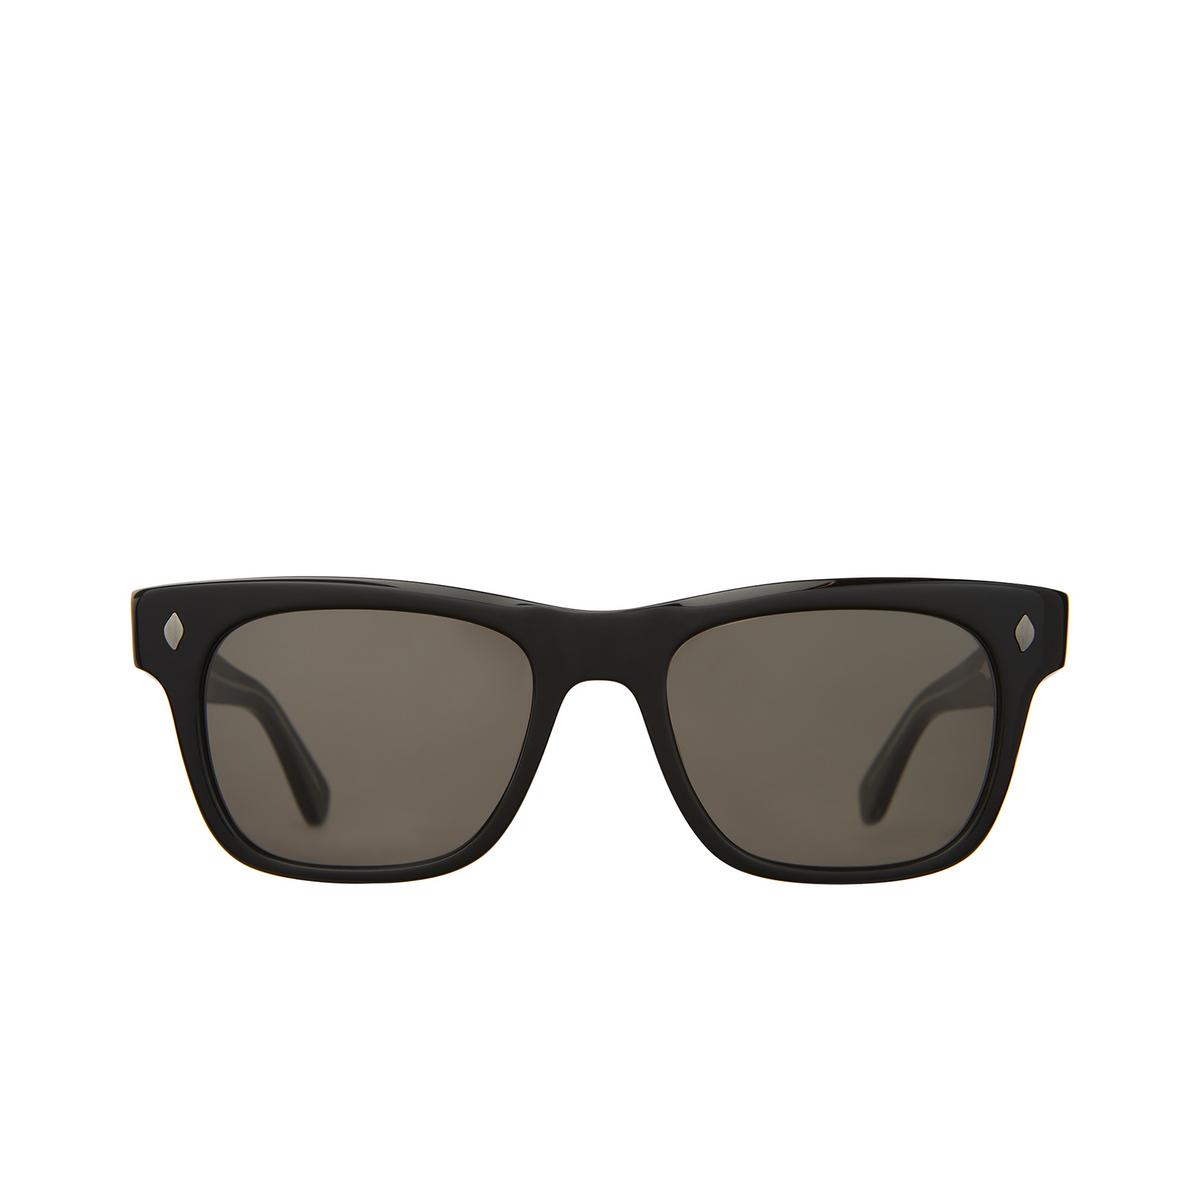 Garrett Leight® Square Sunglasses: Troubadour Sun color Black Bk/gry.